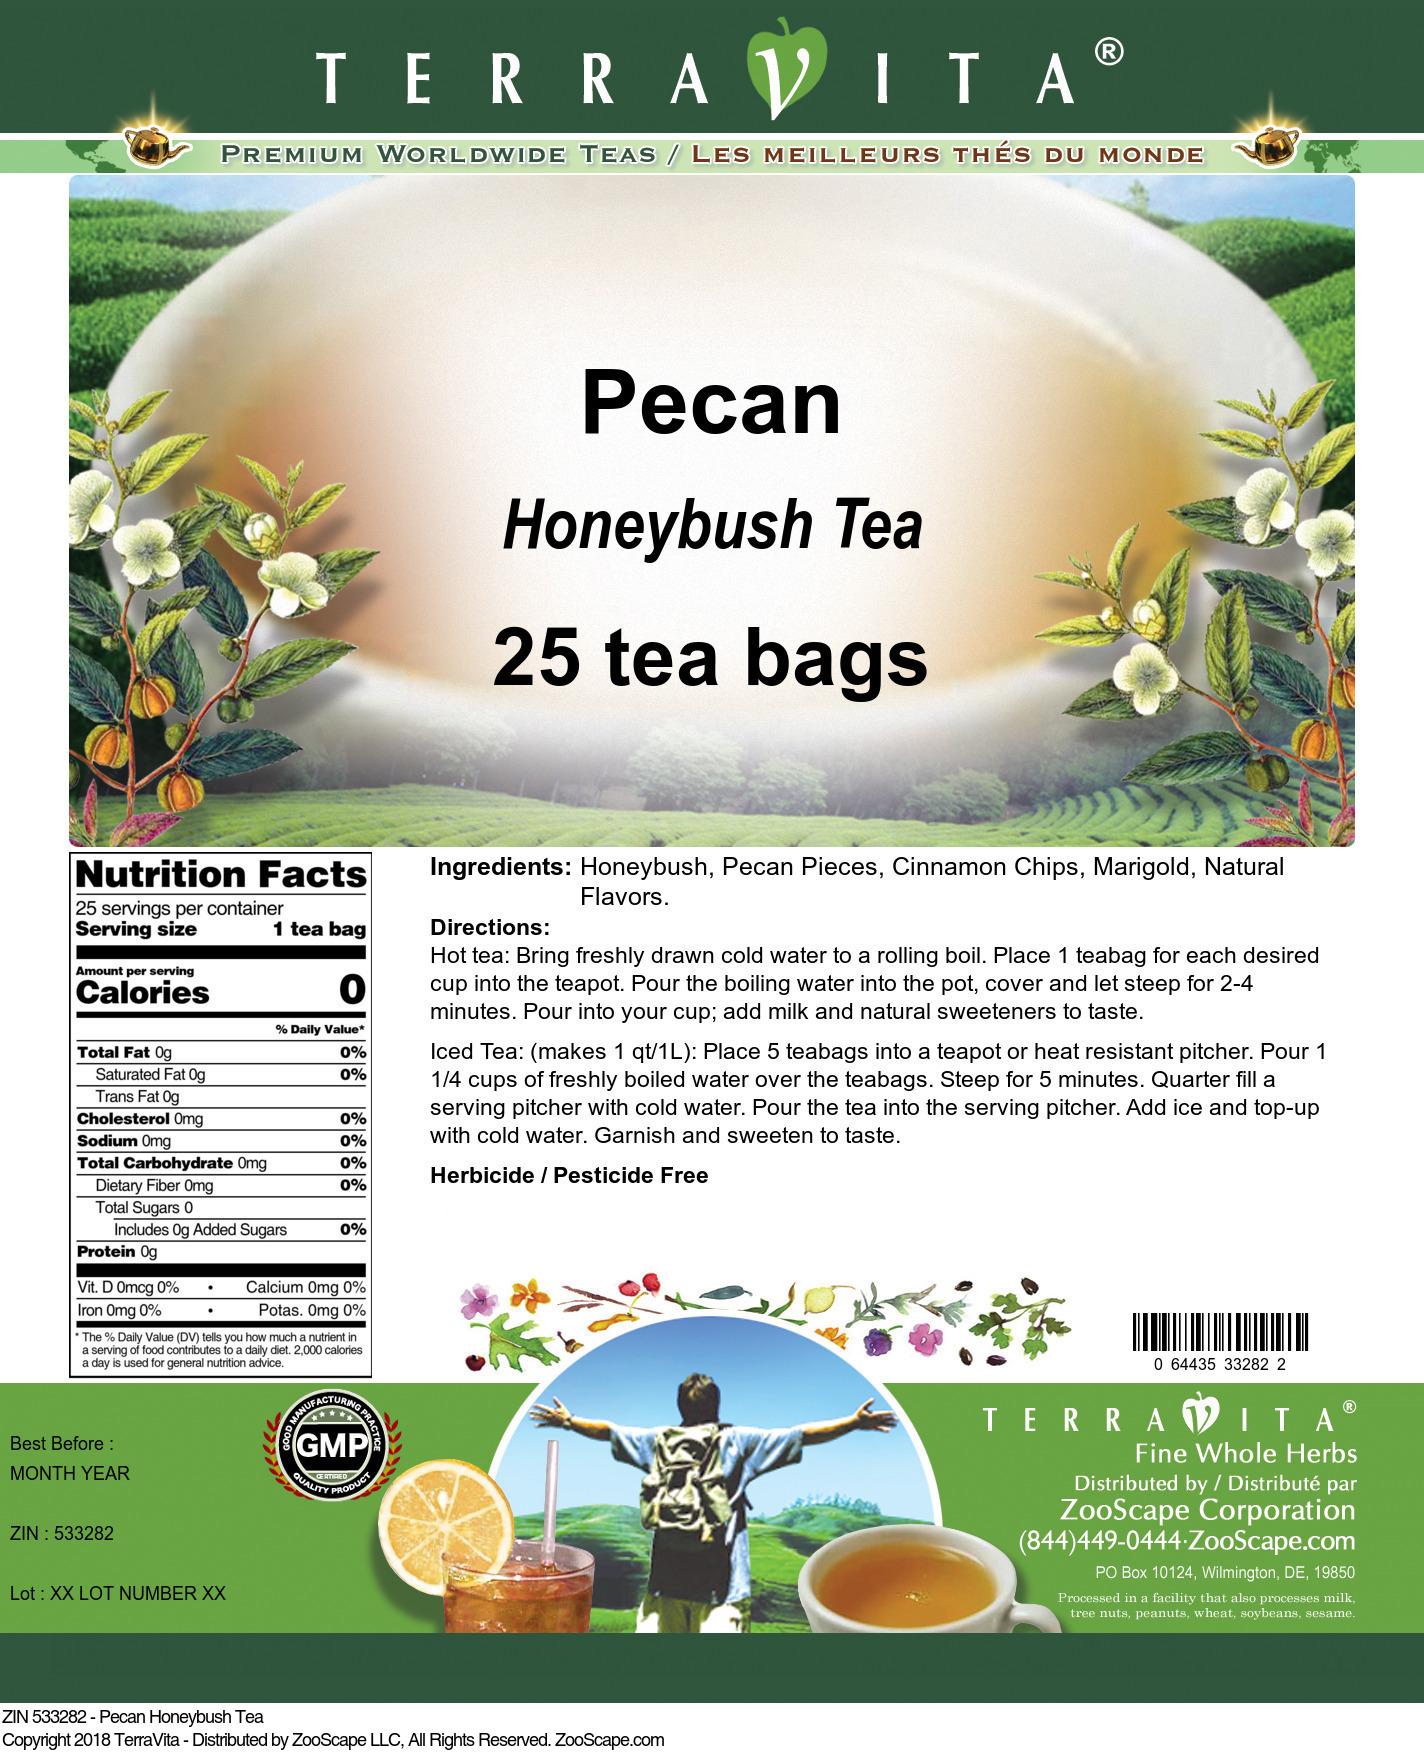 Pecan Honeybush Tea